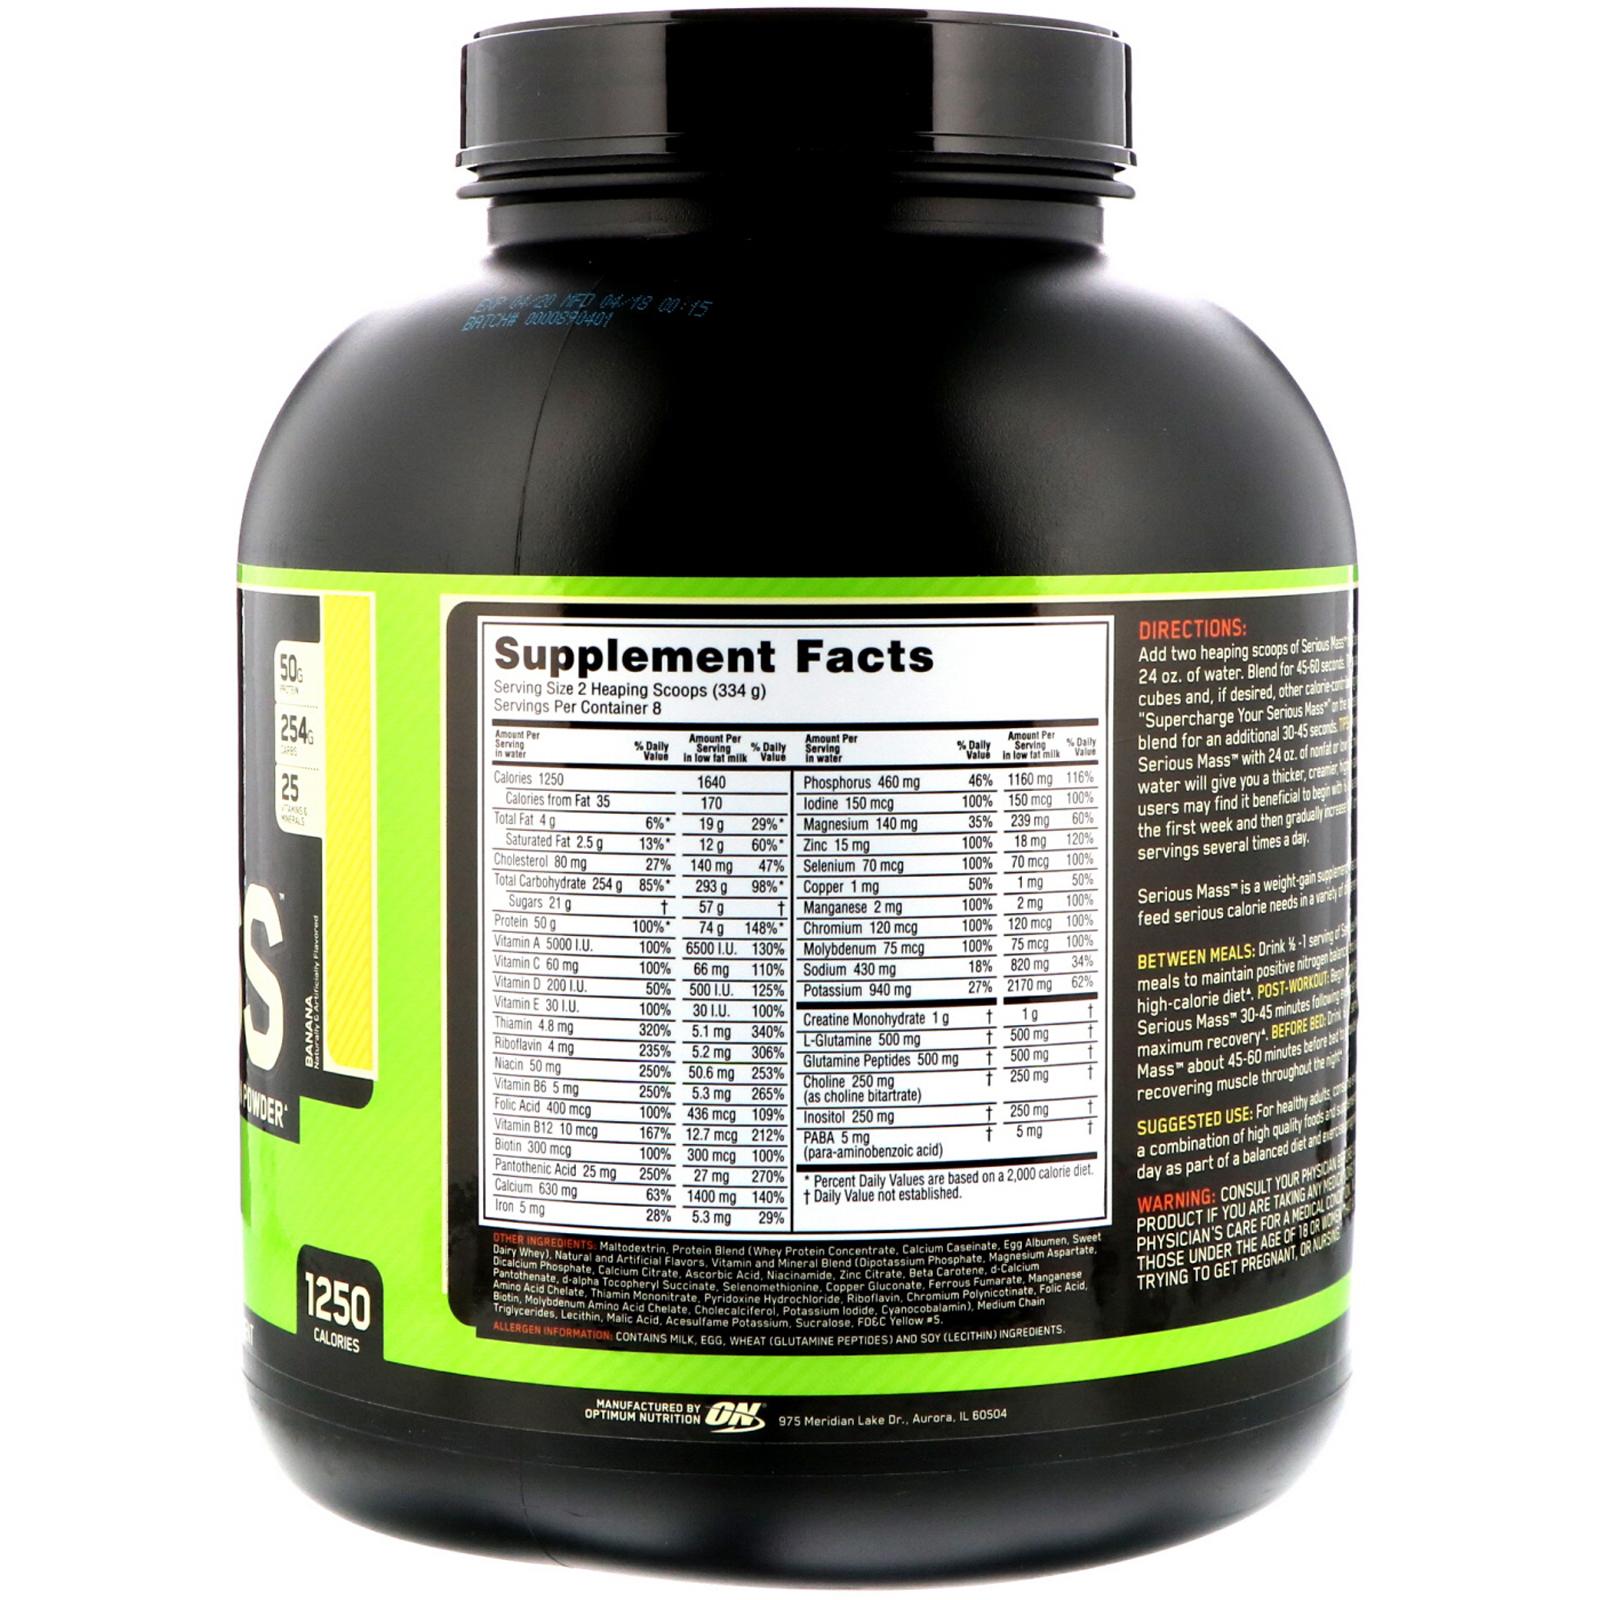 f6af9fd83 Optimum Nutrition, سيرياس ماس، مسحوق اكتساب الوزن عالي البروتين ...